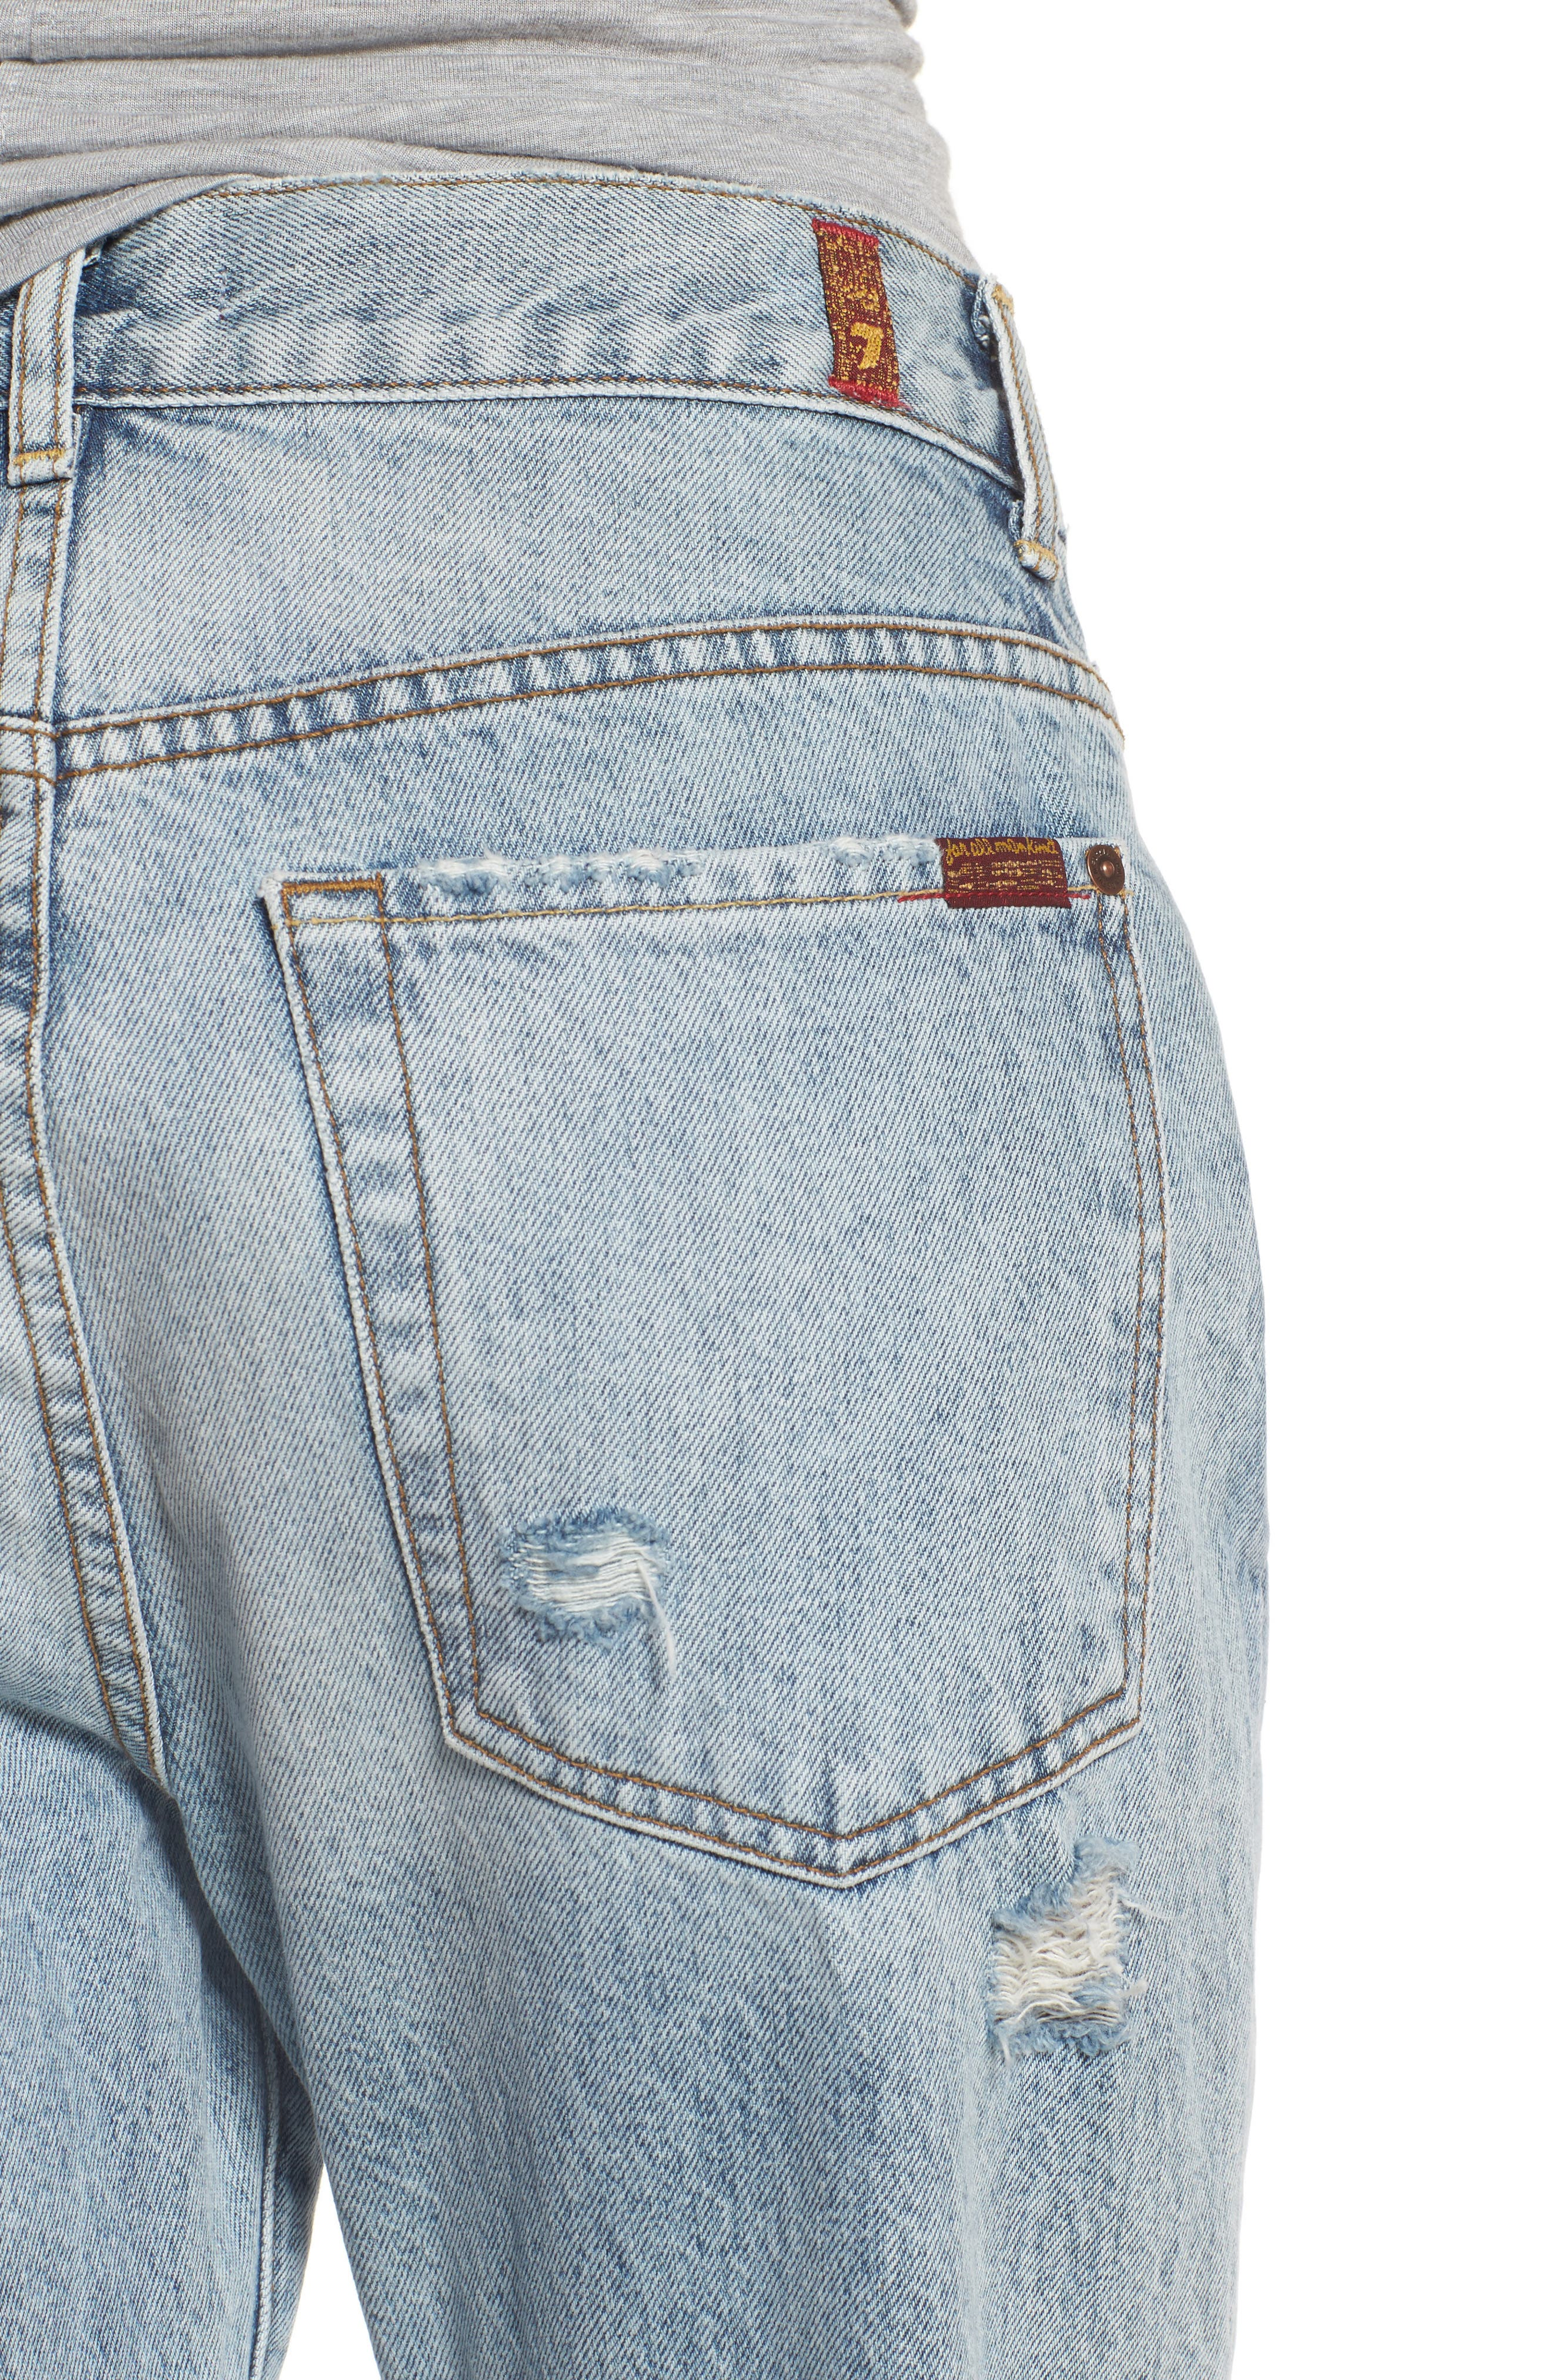 Rickie High Waist Boyfriend Jeans,                             Alternate thumbnail 5, color,                             Mineral Desert Springs 3